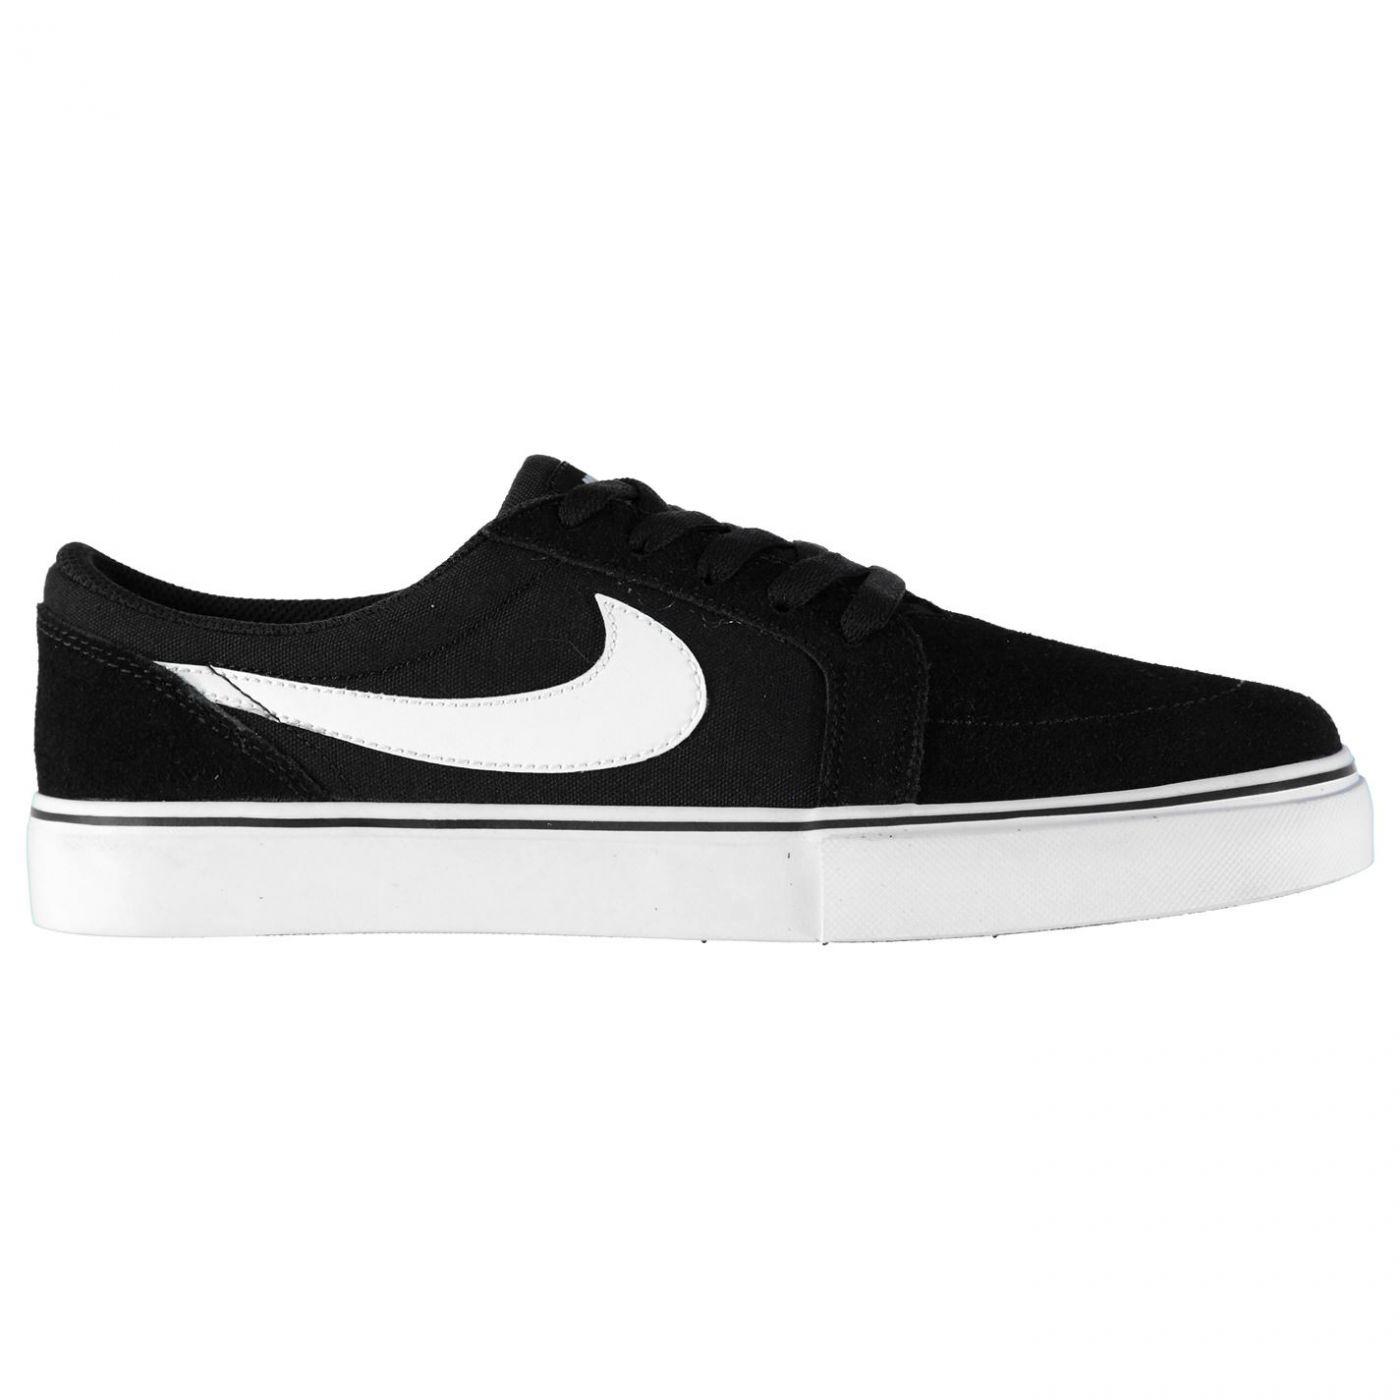 6b4a204e11b Nike SB Satire II Mens Skate Shoes - FACTCOOL